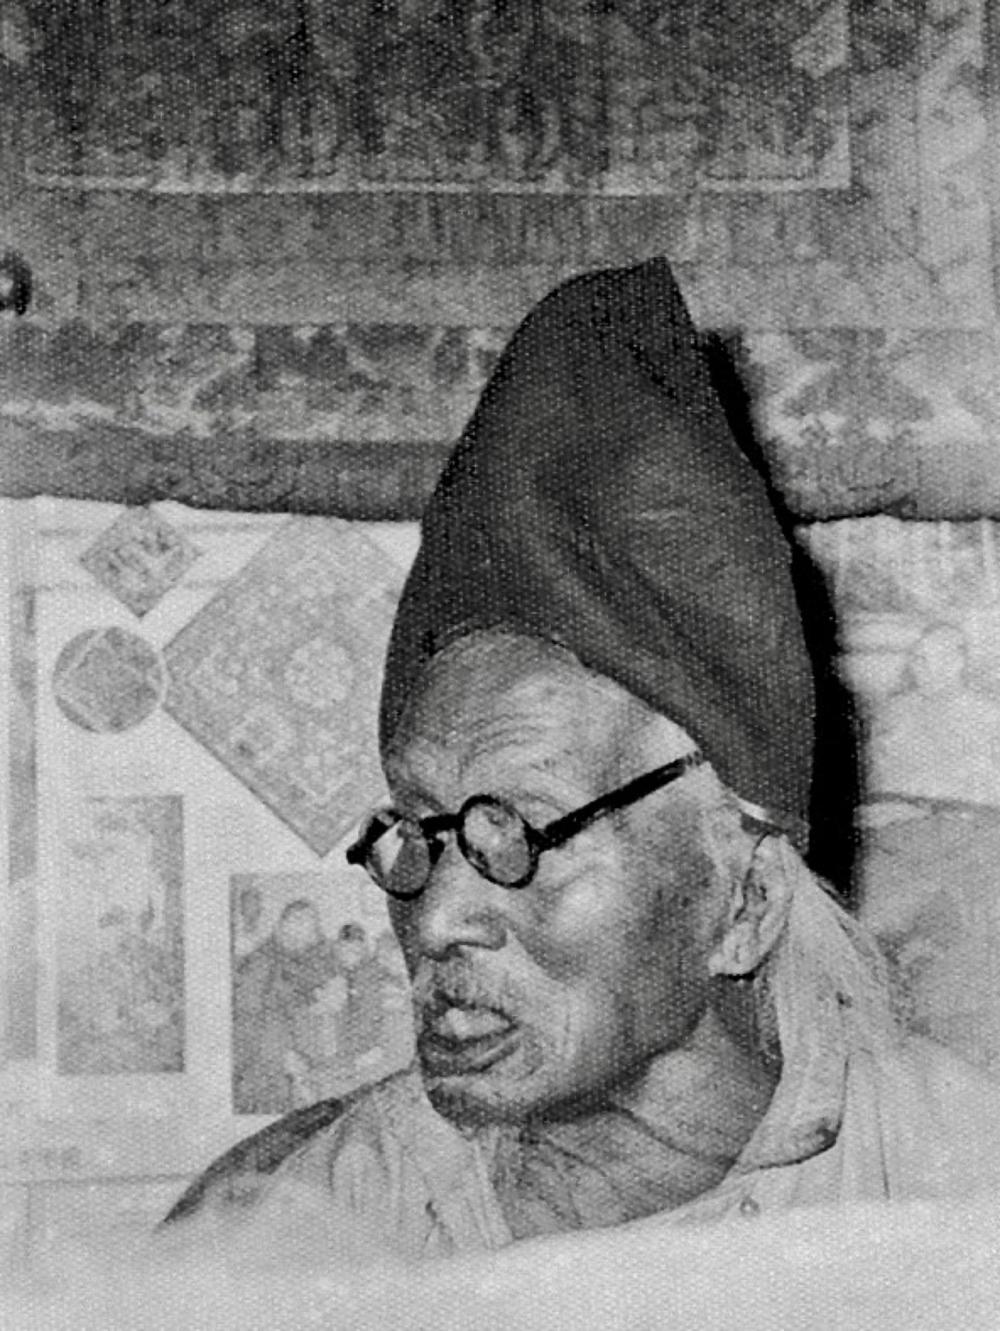 Levitating Monk, c. 1958